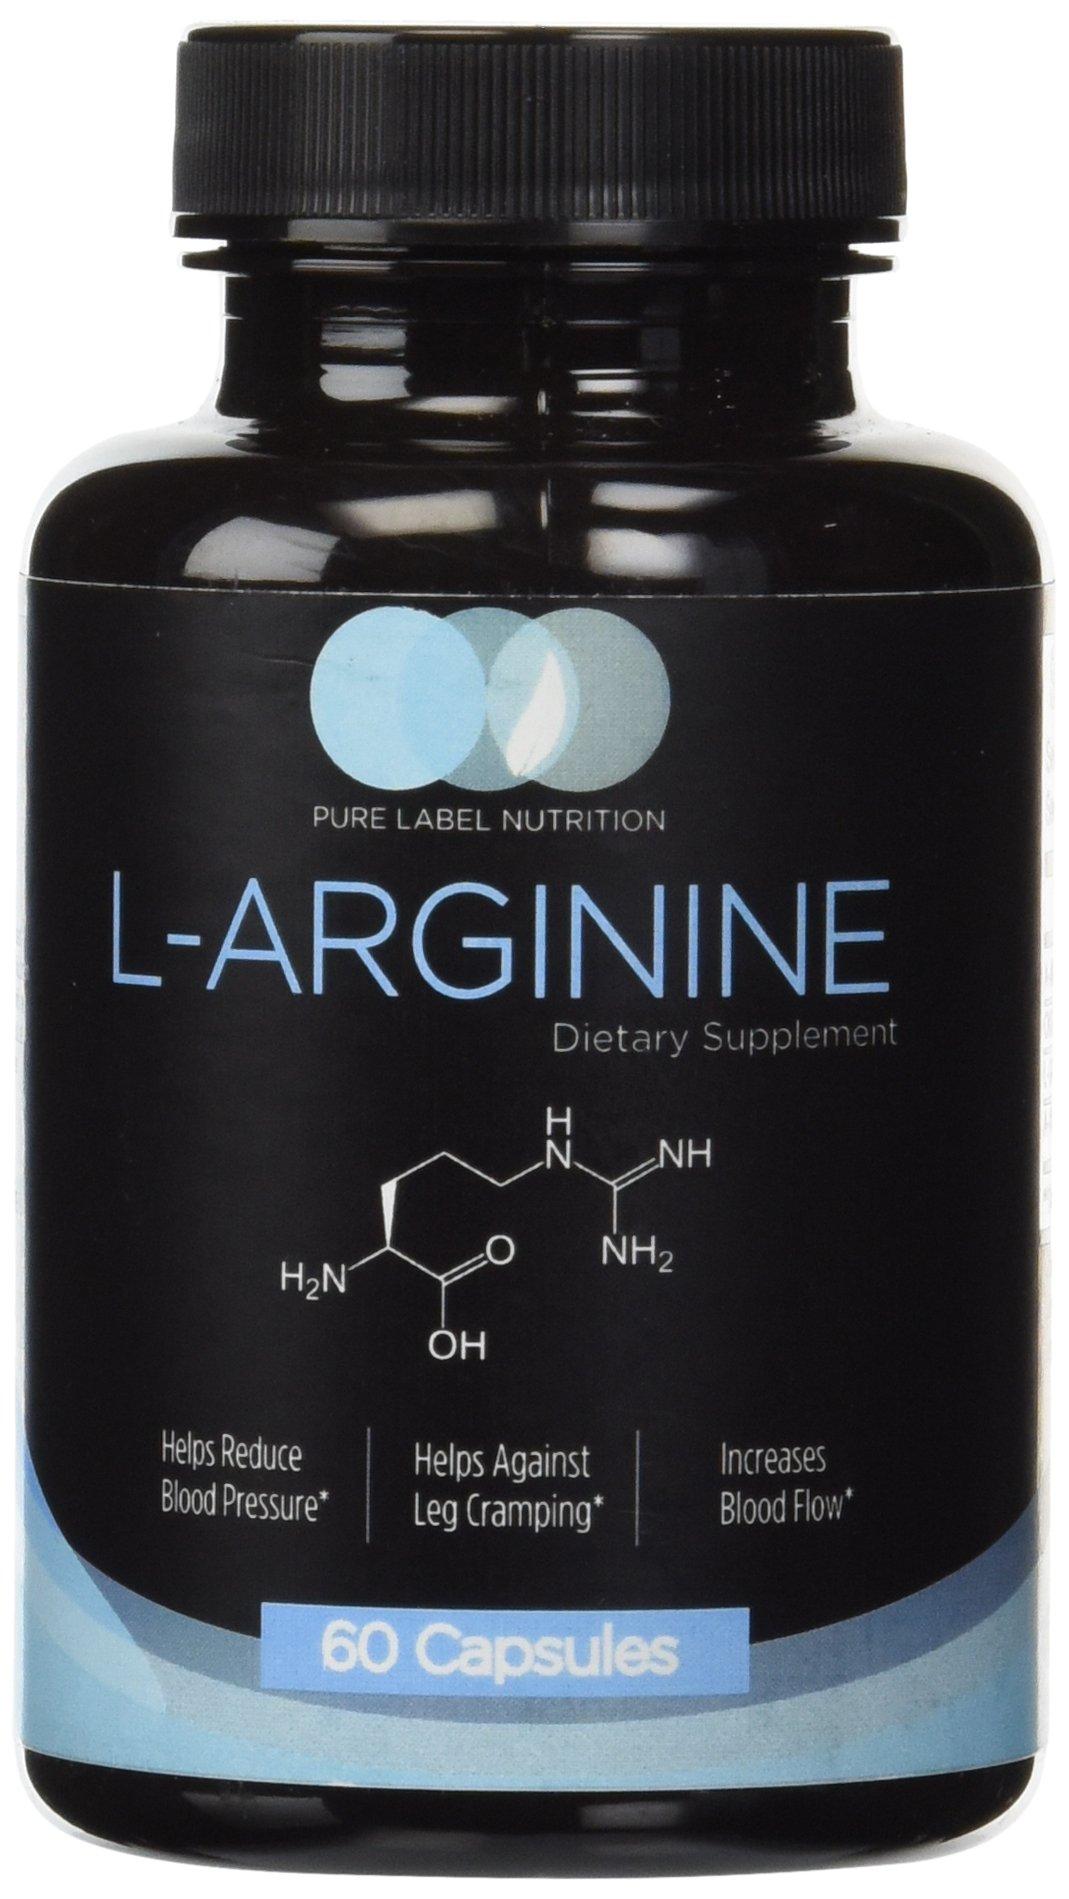 Does arginine help sex drive